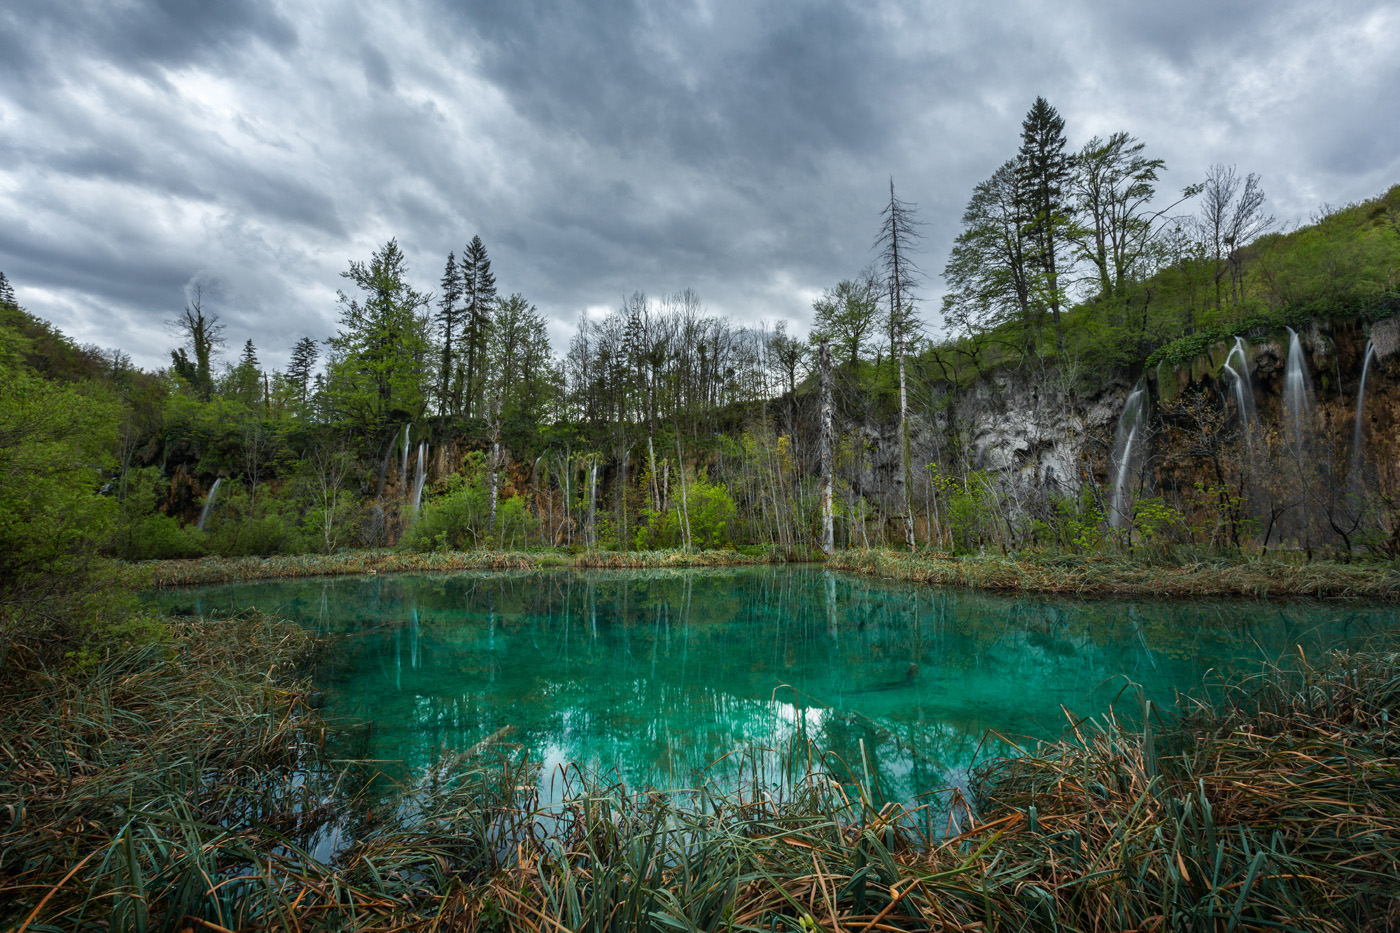 photographe-paysage-croatie-Plitvice-guillaume-heraud-01